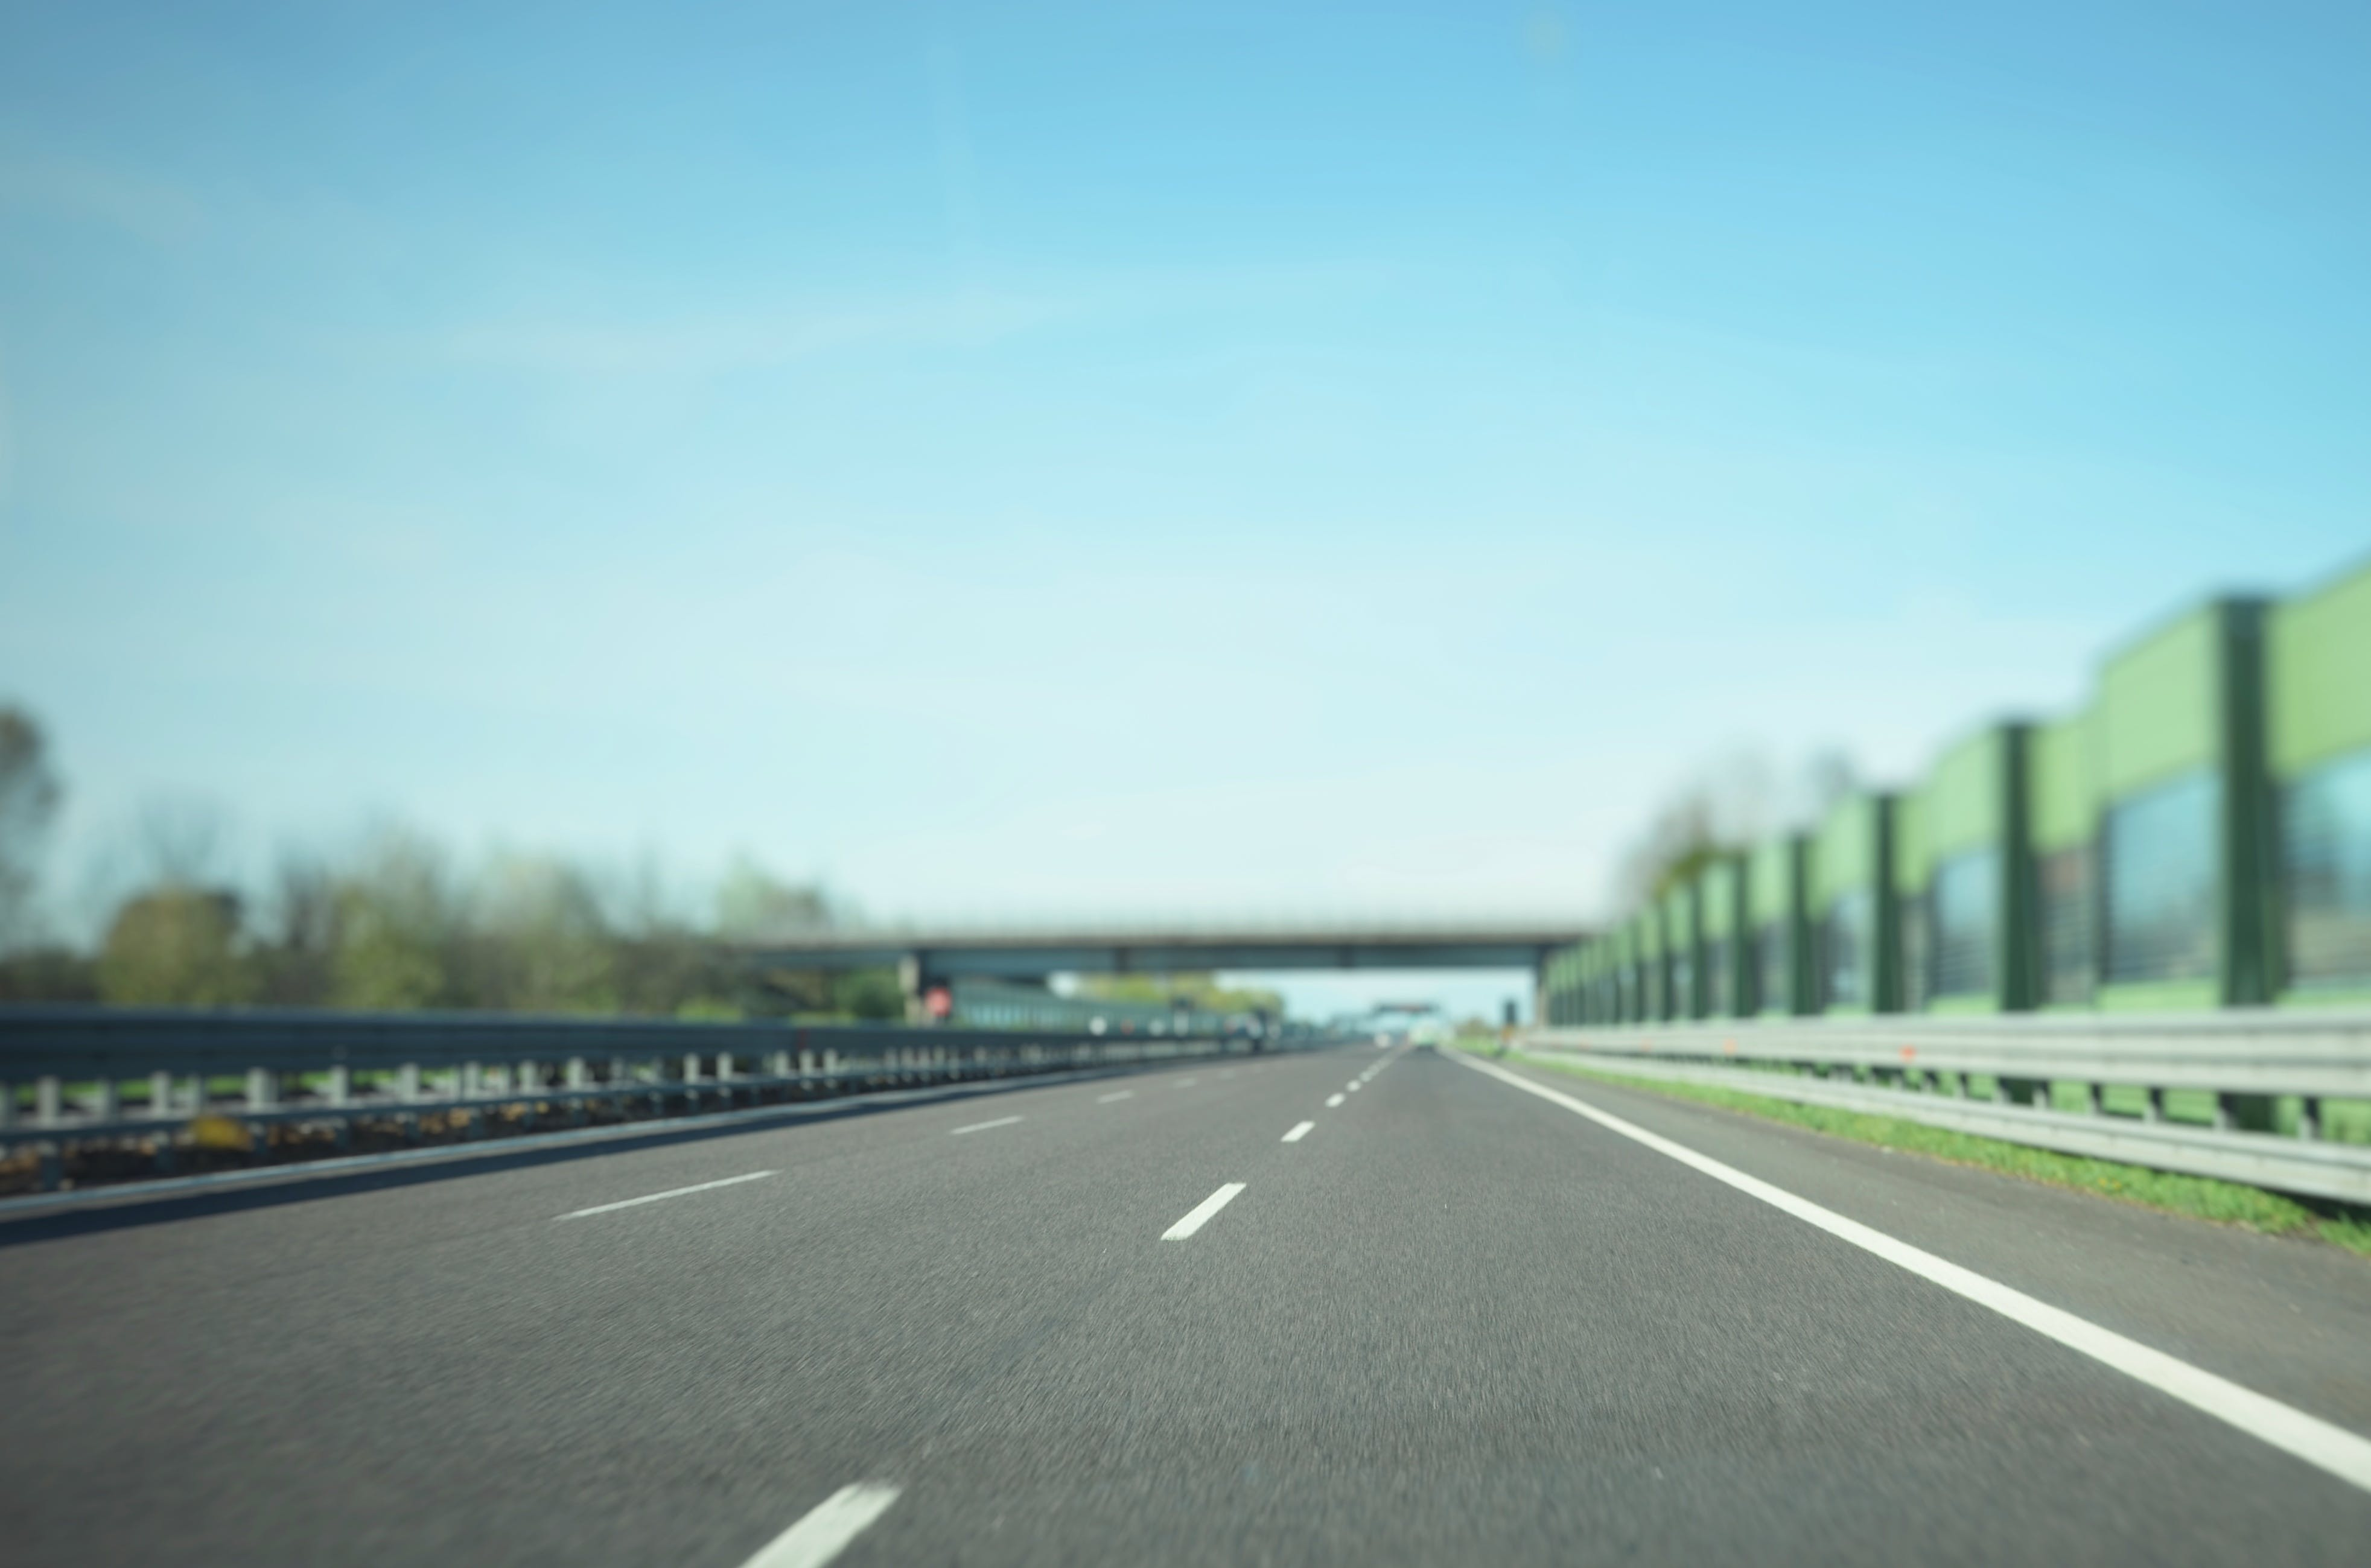 Kostenloses Stock Foto zu asphalt, beratung, bürgersteig, fahrbahn